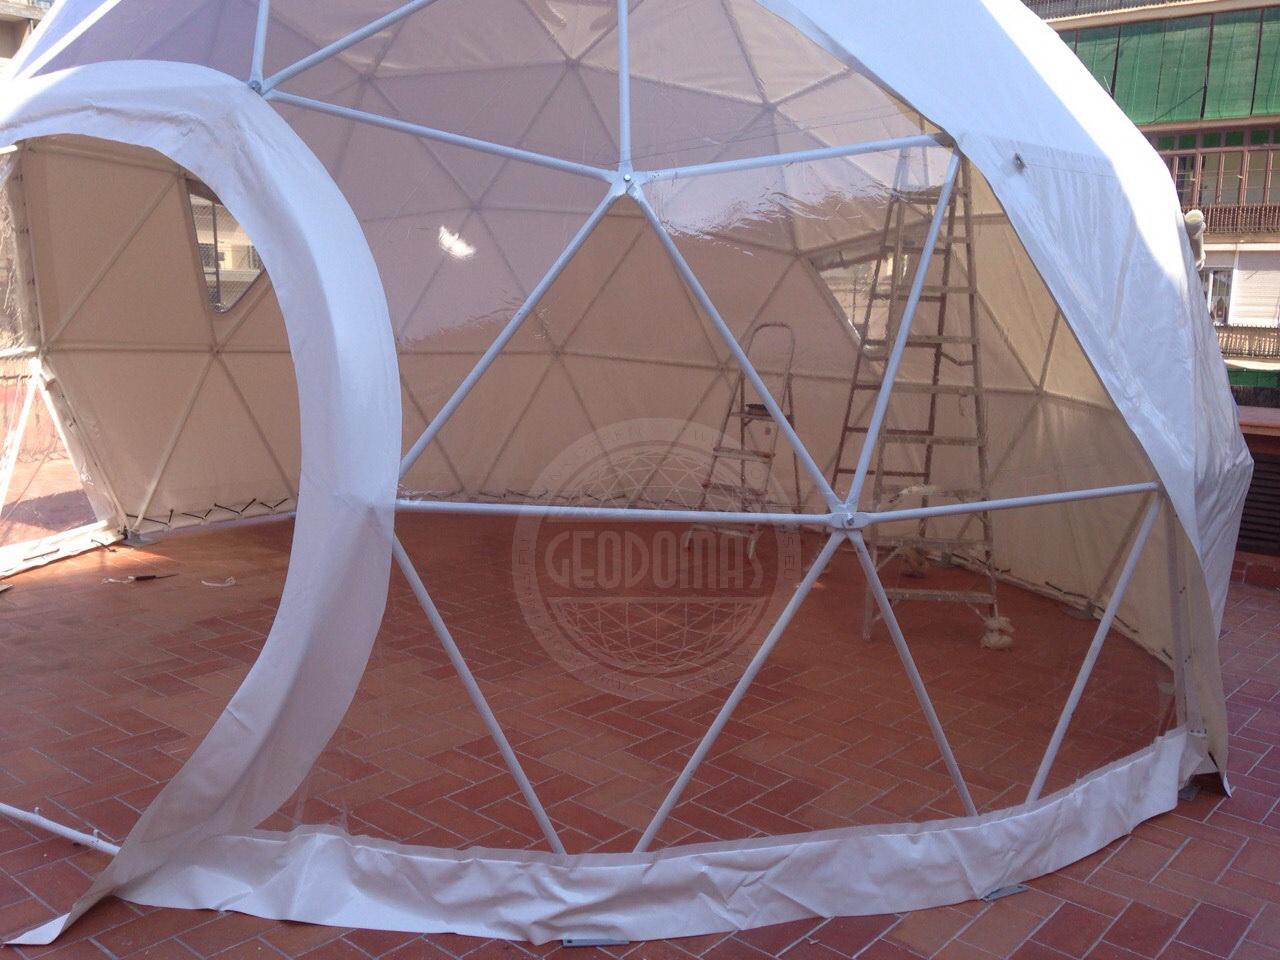 28m² Event Dome Ø6m F3 H3,5 | Barcelona